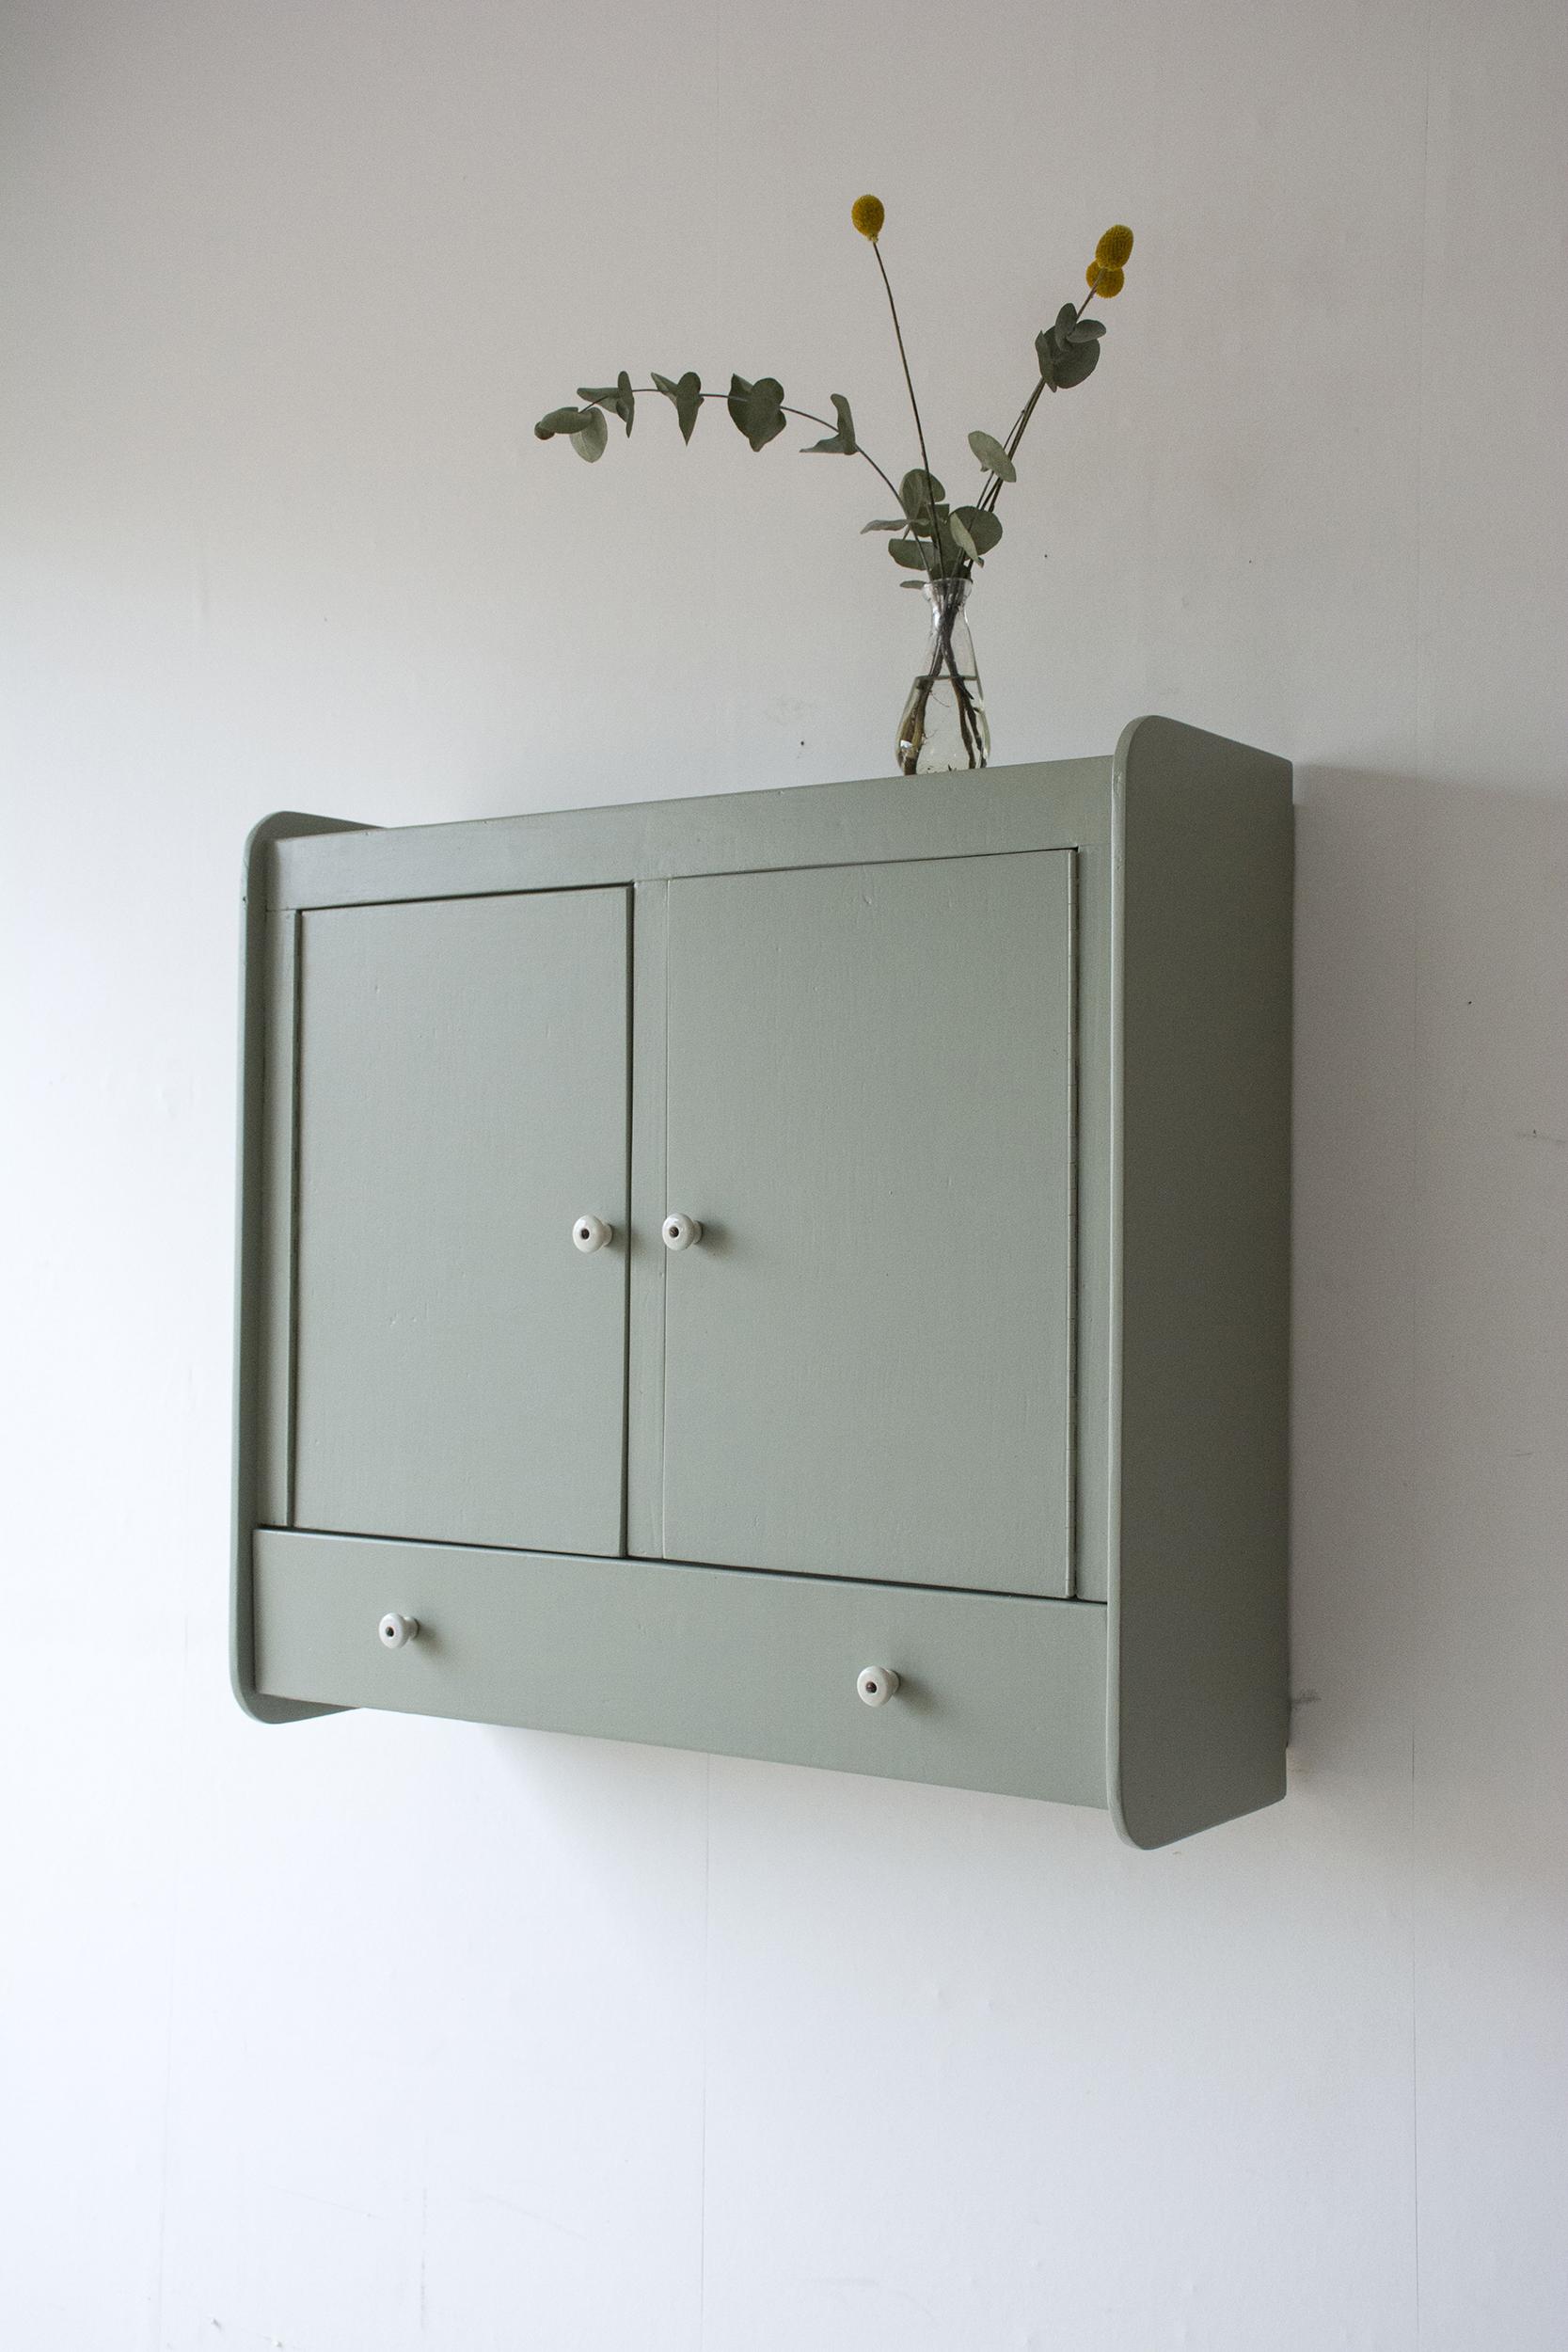 tijmgroen wandkastje met deurtjes en klepla - Firma zoethout_2.jpg